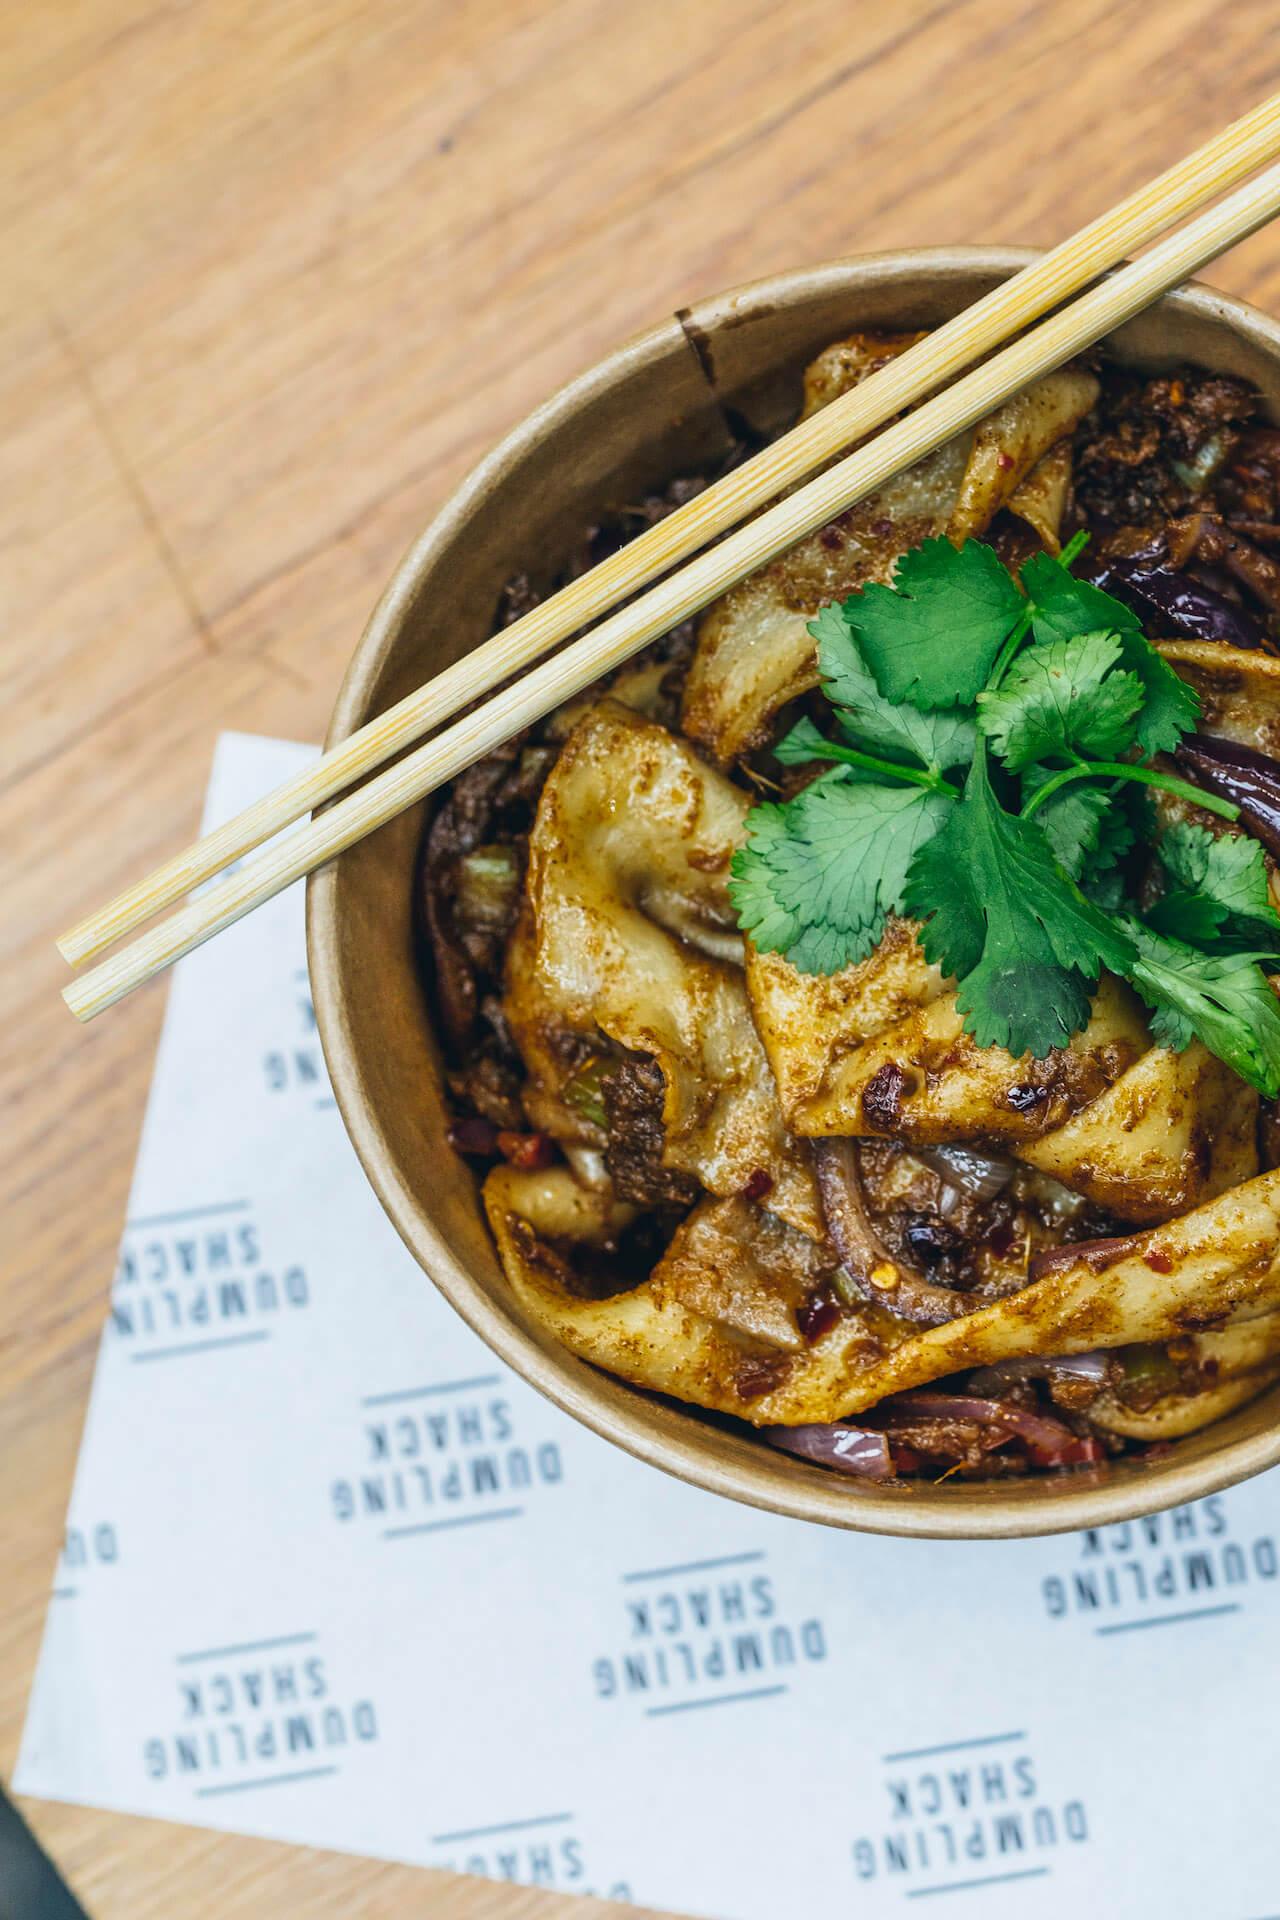 cumin-lamb-hand-pulled-noodles-dumpling-shack-london.jpg